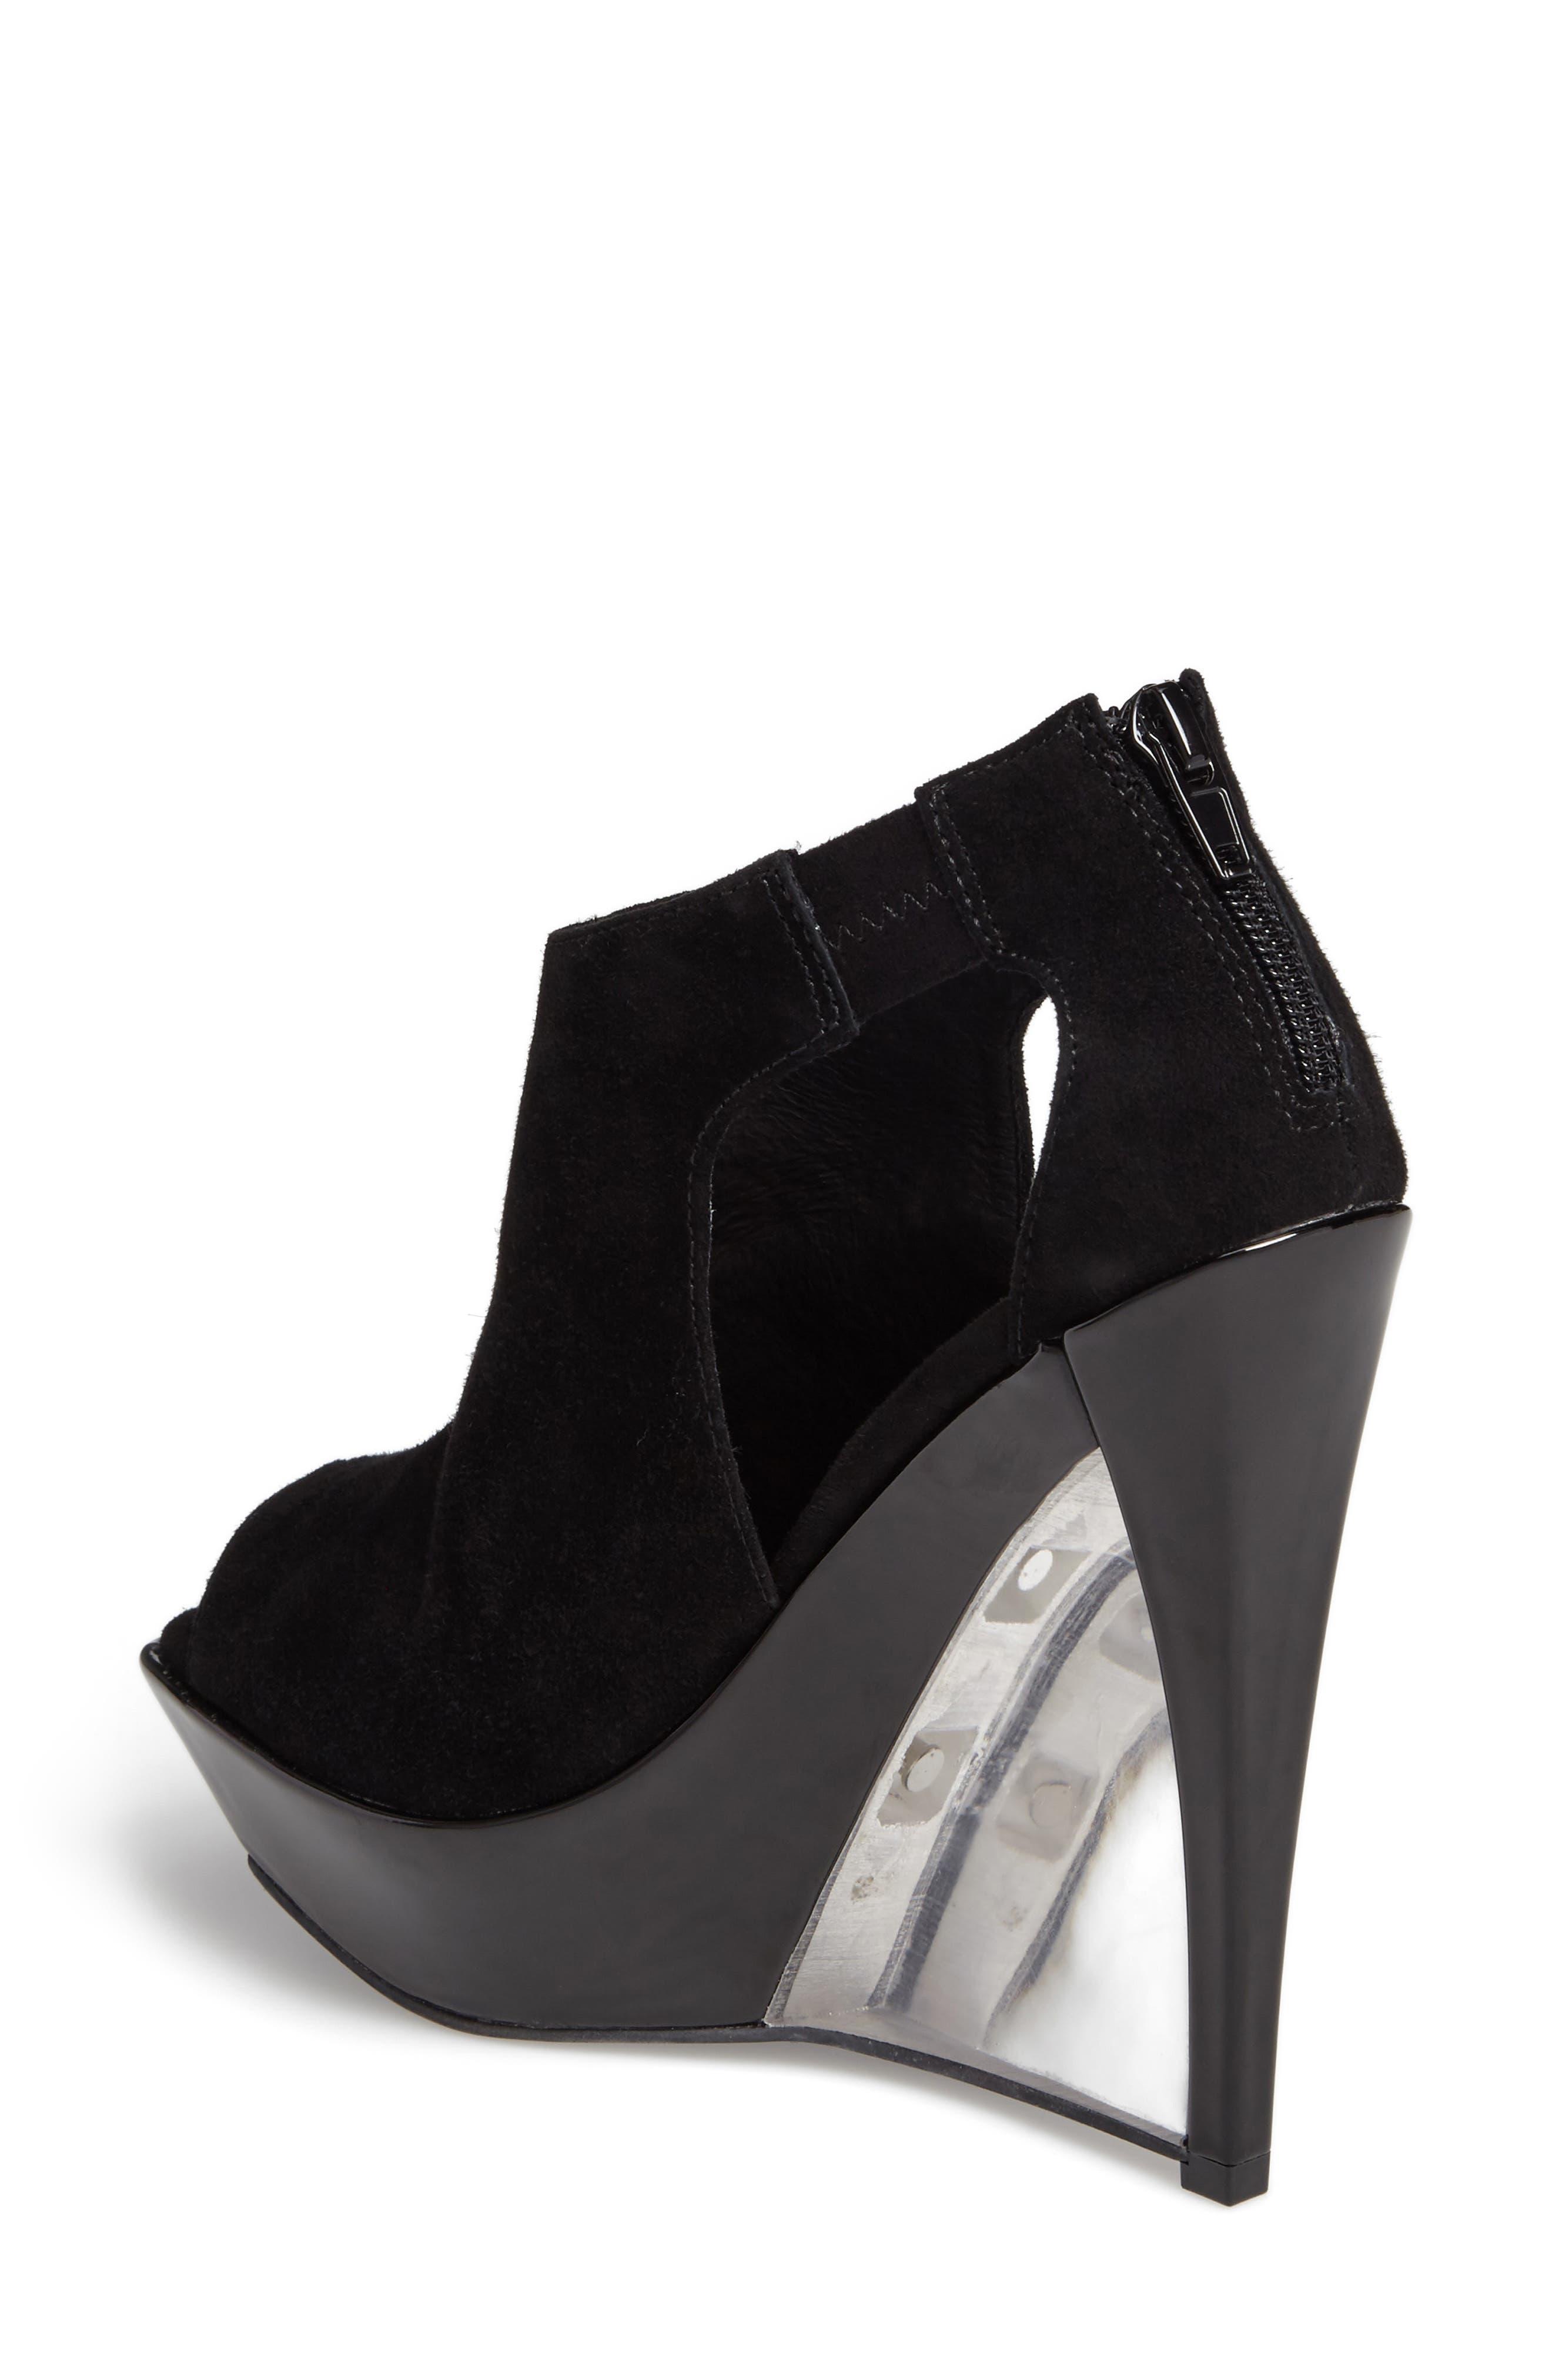 Dunya Cutout Platform Wedge Sandal,                             Alternate thumbnail 2, color,                             Black Clear Leather